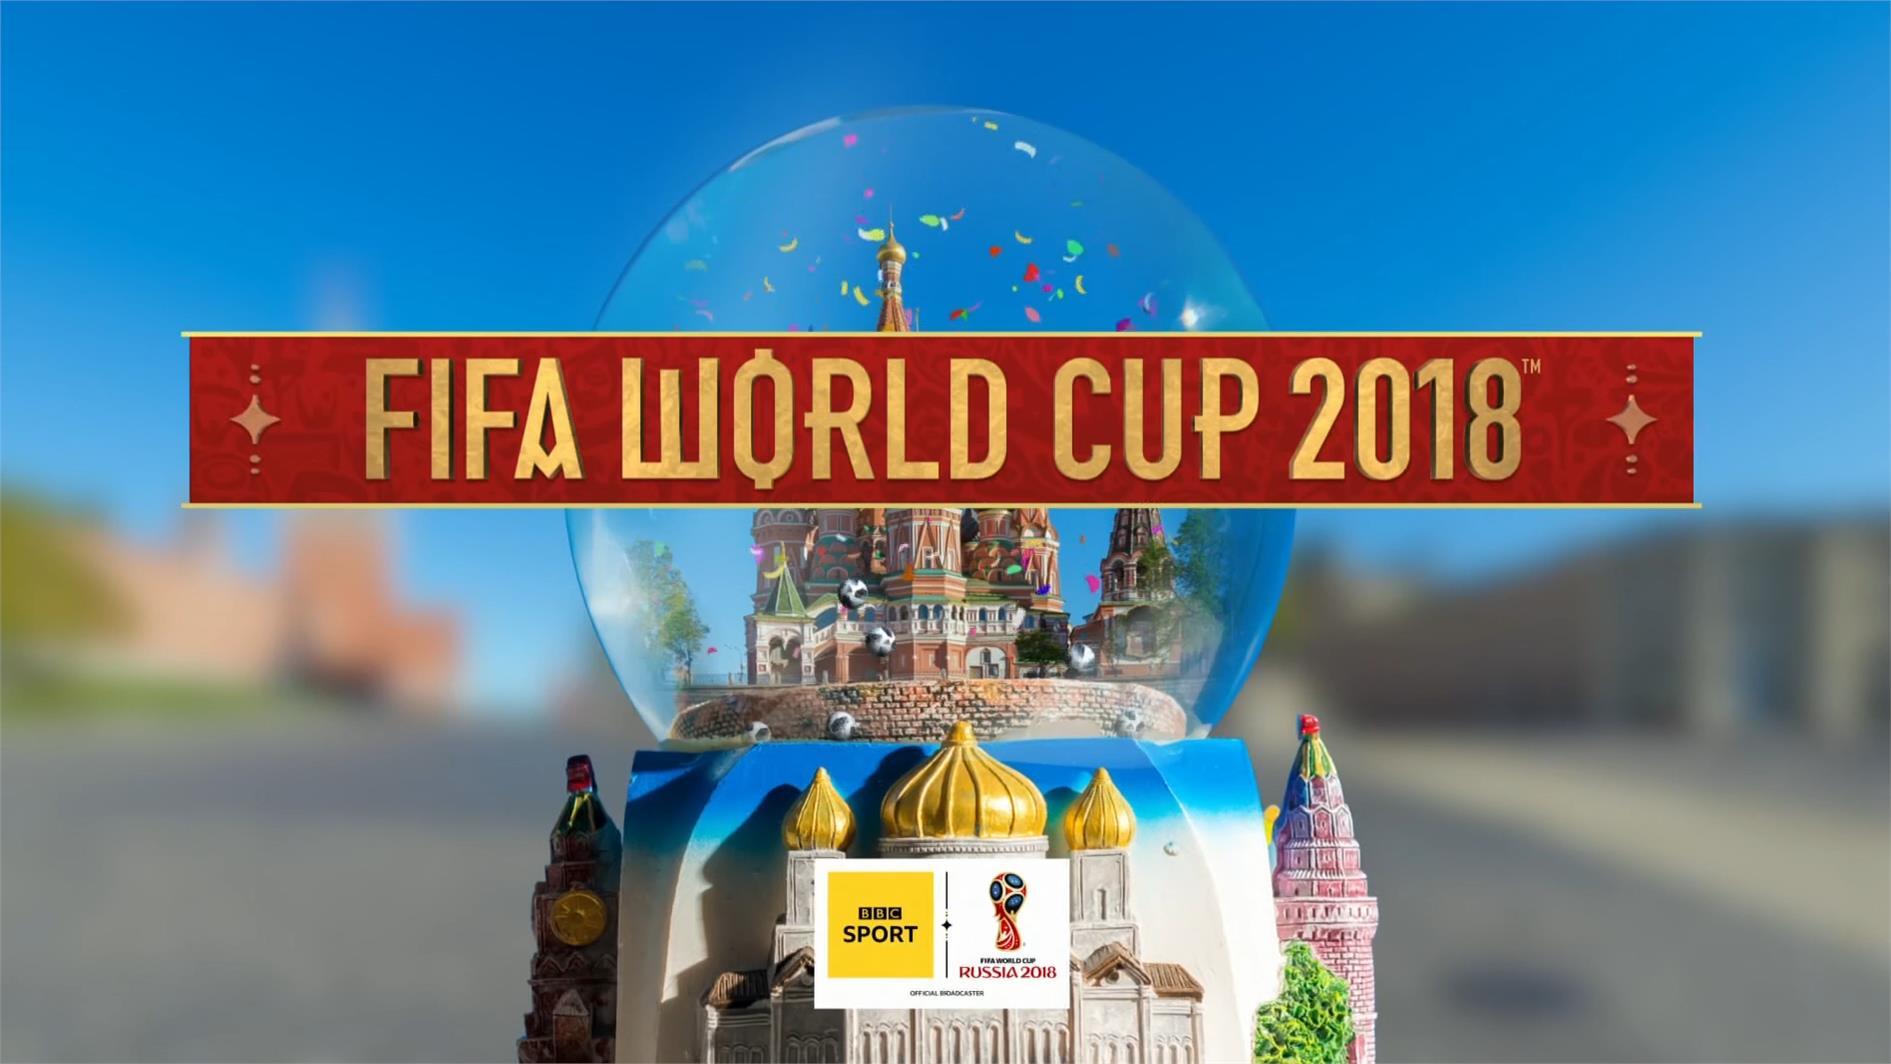 World Cup 2018 – BBC Presentation